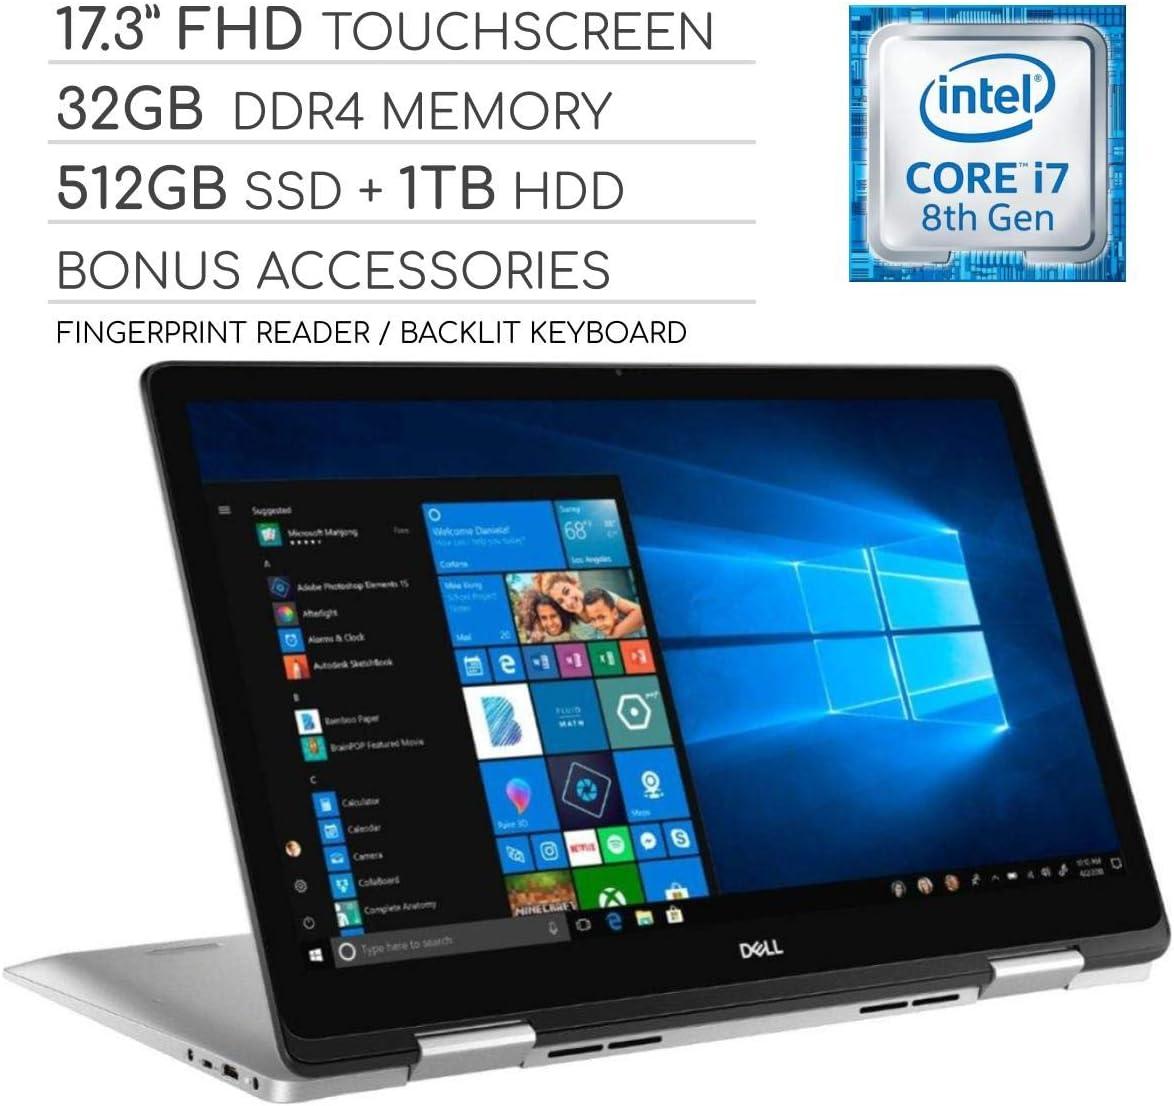 "Dell Inspiron 17 7000 Series 2019 2-in-1 17.3"" FHD Touchscreen Laptop, 4-Core Intel Core i7-8565U 1.8GHz, 32GB RAM, 512GB SSD + 1TB HDD, Backlit Keyboard, Wi-Fi, Bluetooth, Webcam, HDMI, Windows 10"